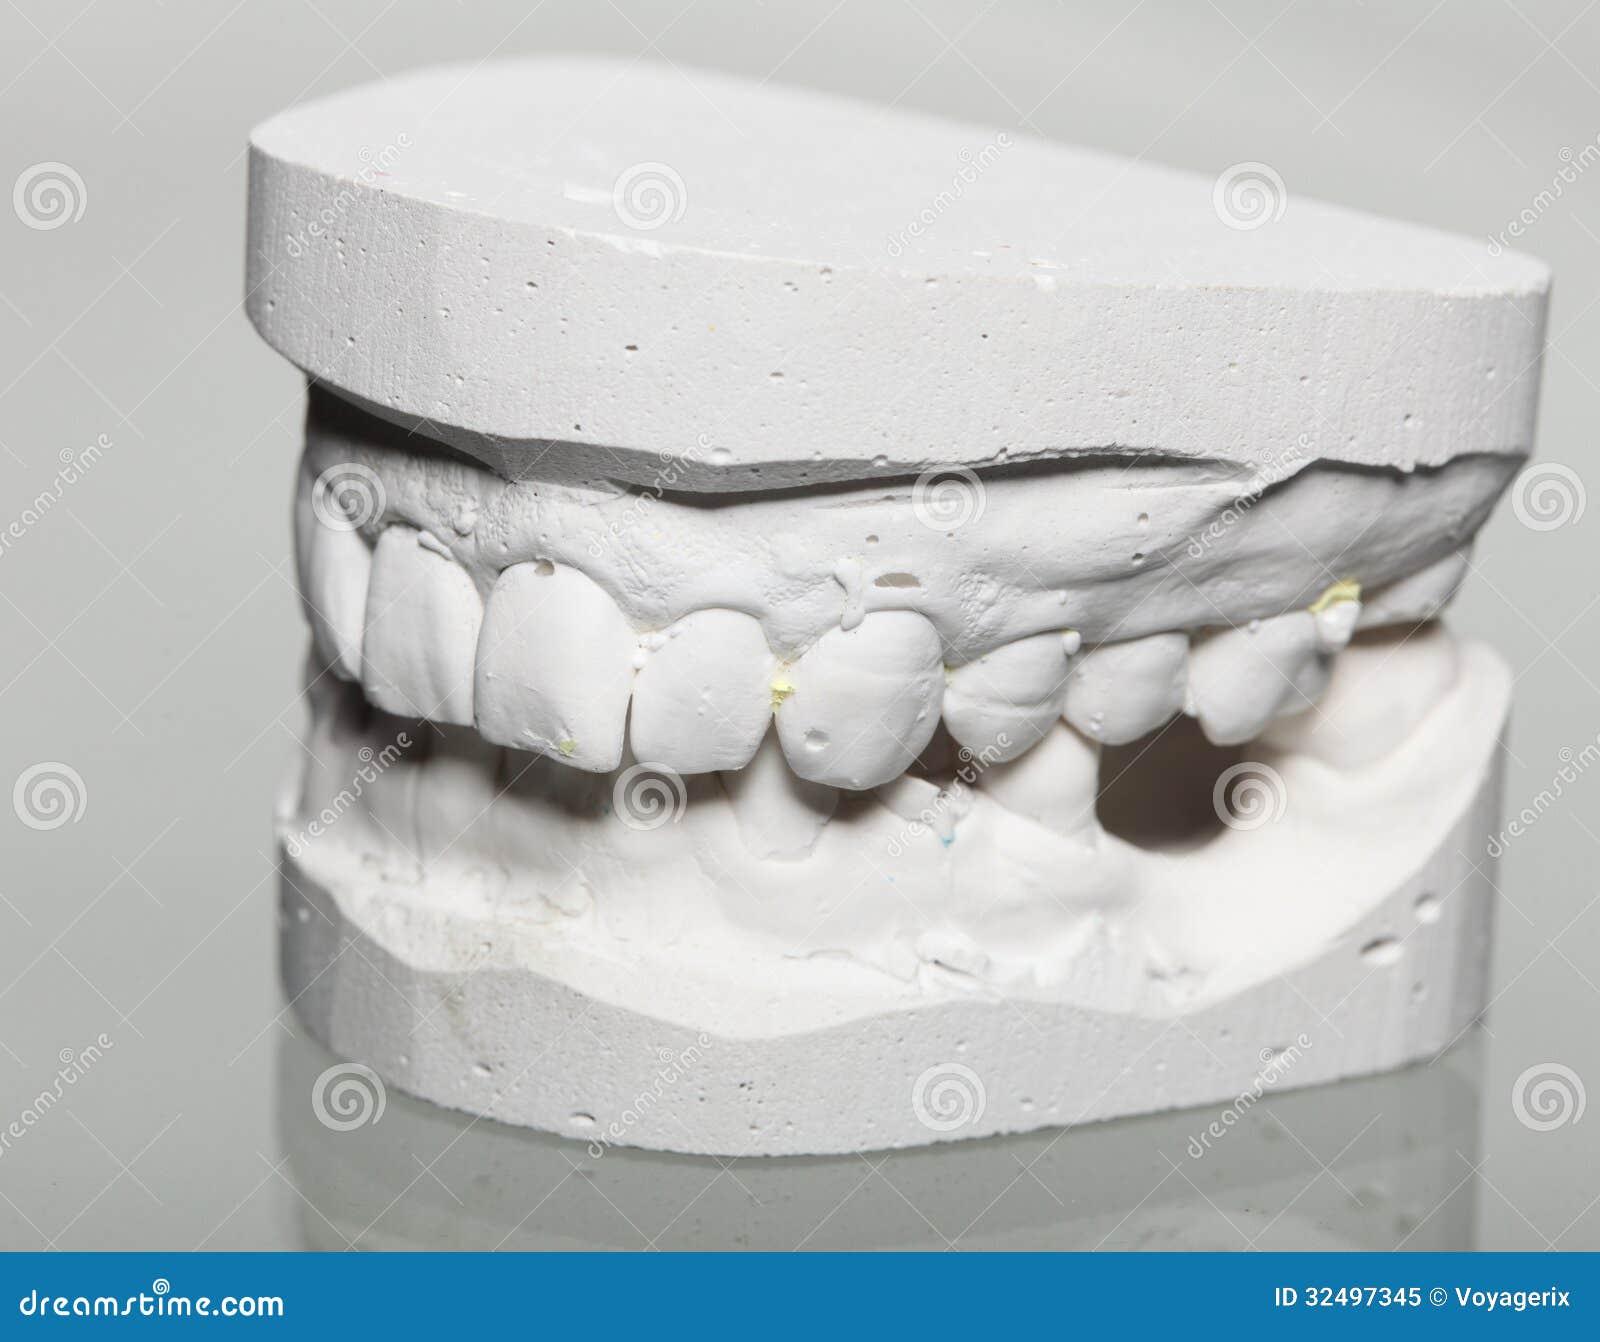 Tire Plaster Castings : Dental gypsum model mould of teeth in plaster stock image